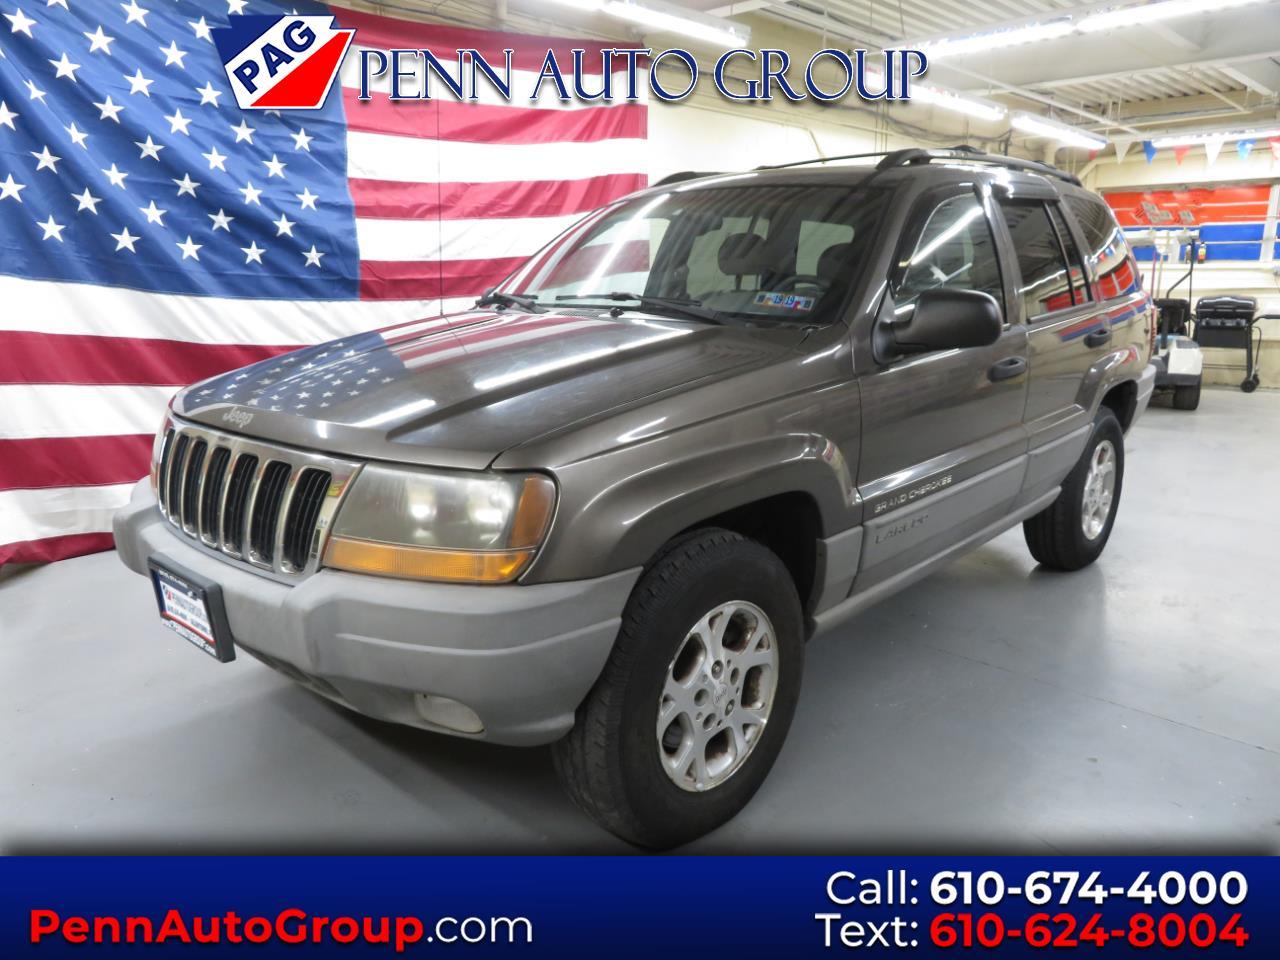 2000 Jeep Grand Cherokee 4dr Laredo 4WD